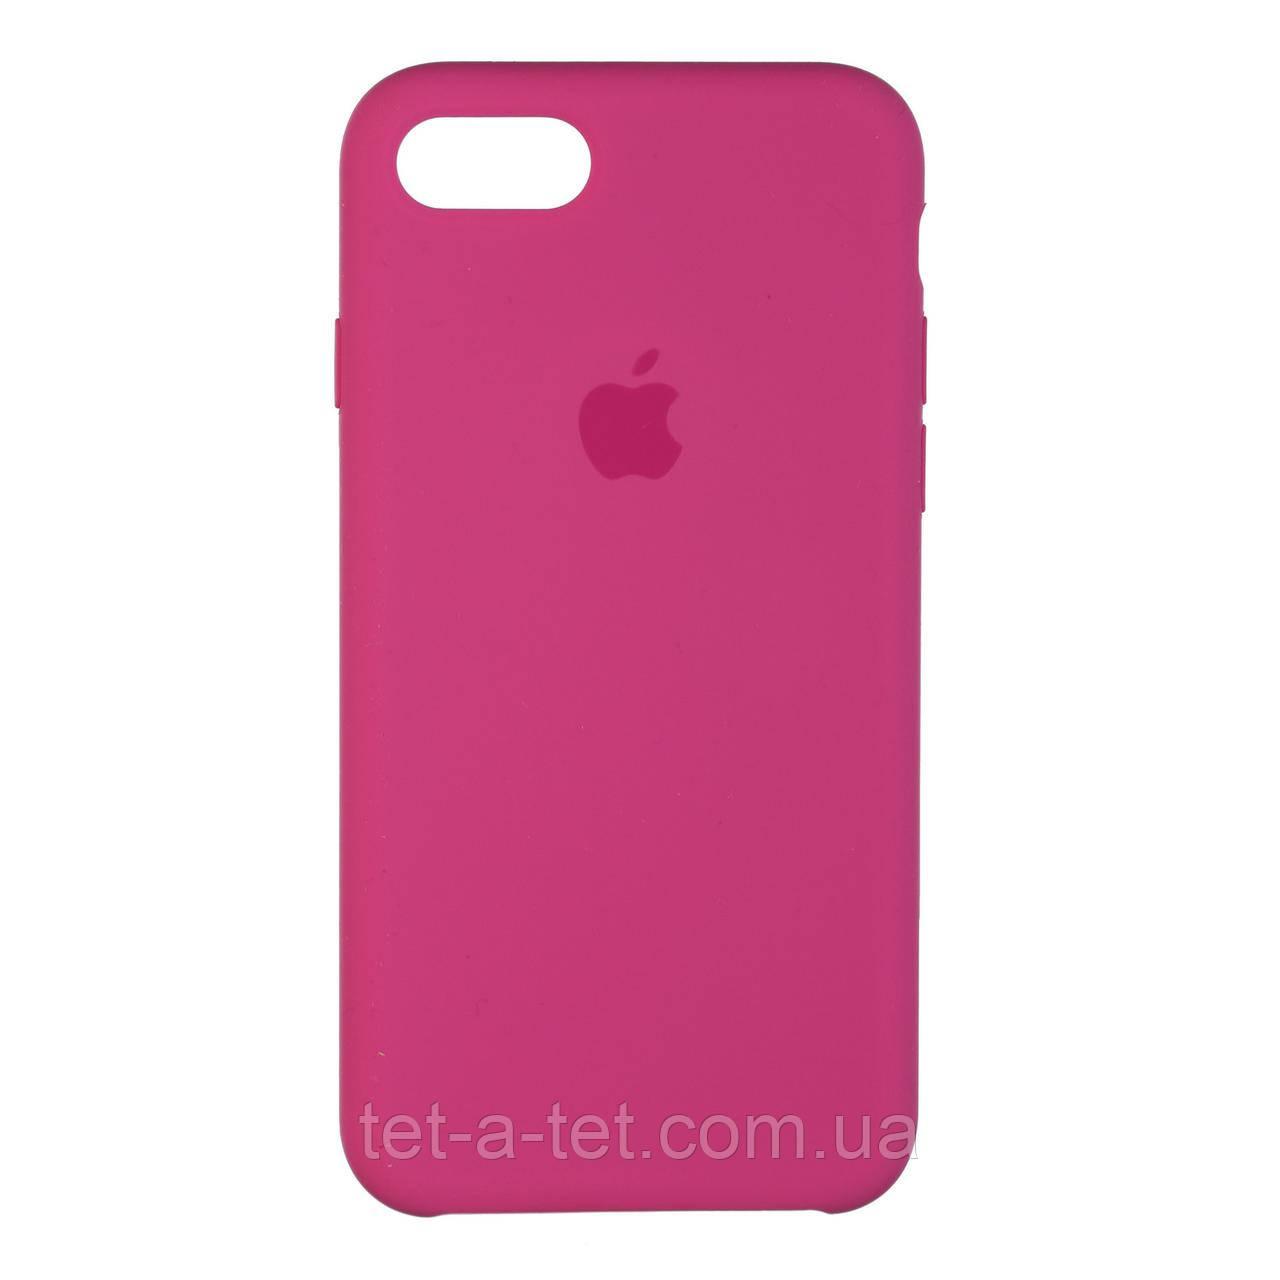 Чехол Silicone Case Original for Apple iPhone 7/8/SE 2020 (HC) - Dragon Fruit